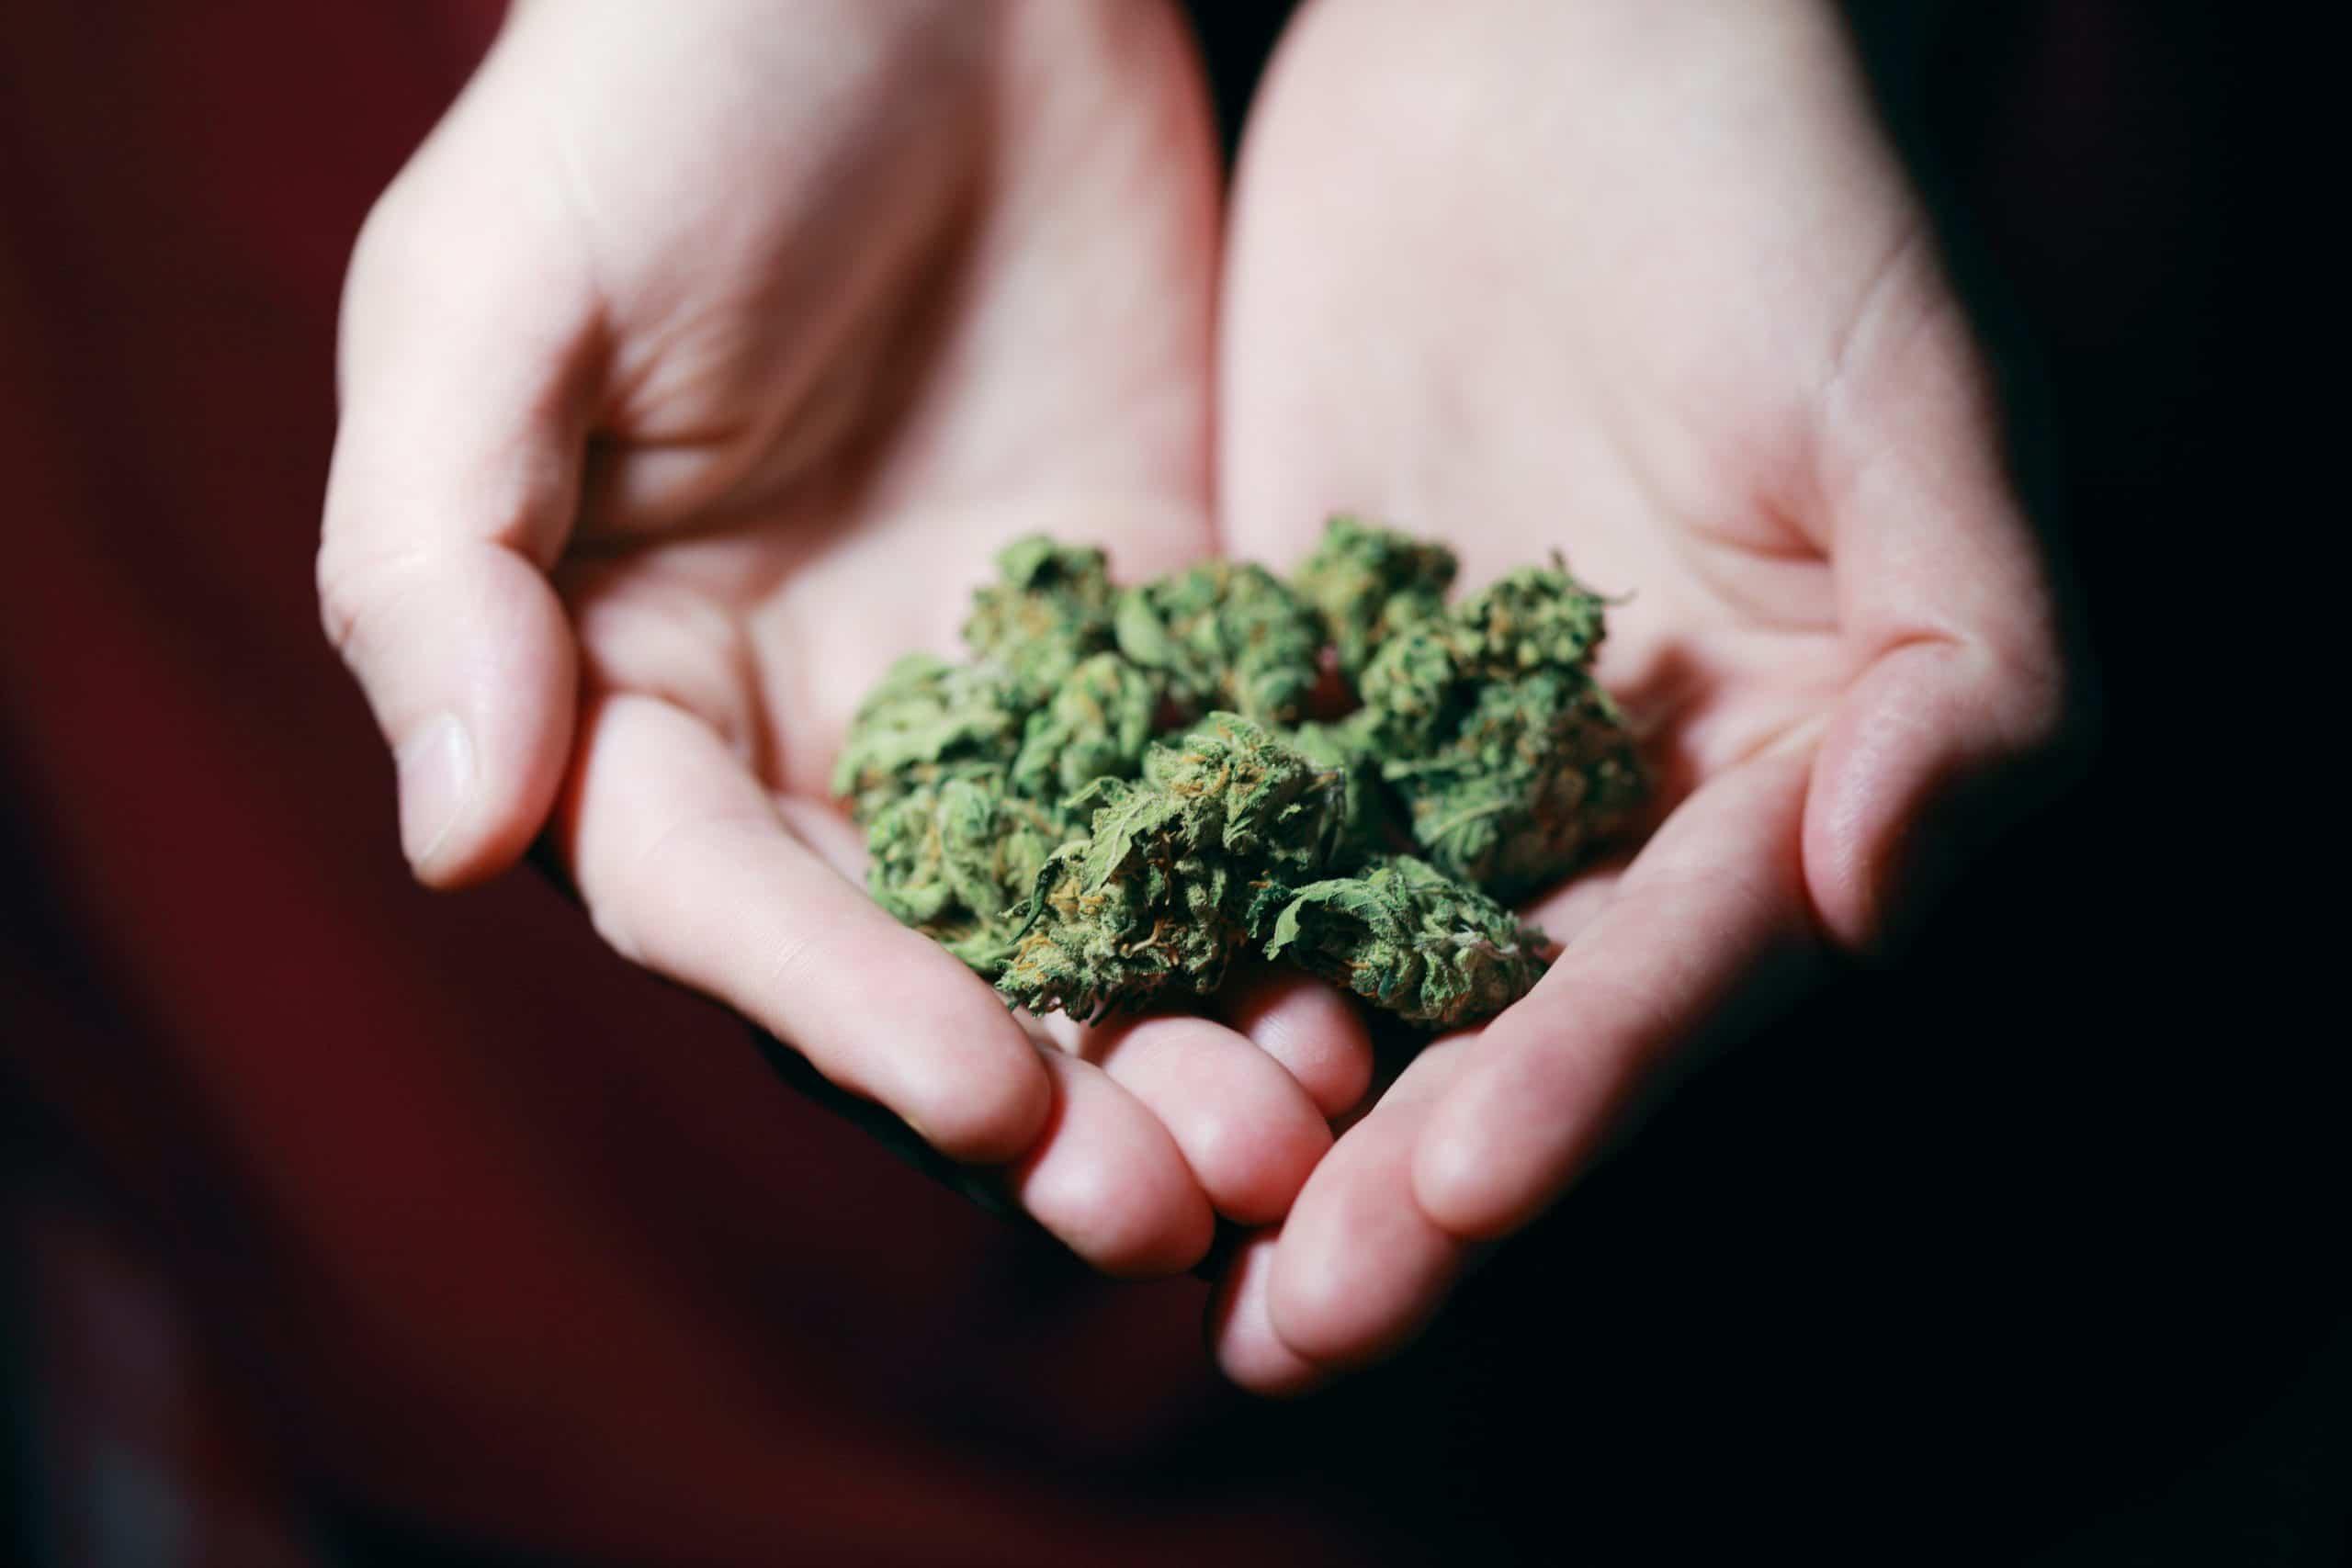 possession of drugs